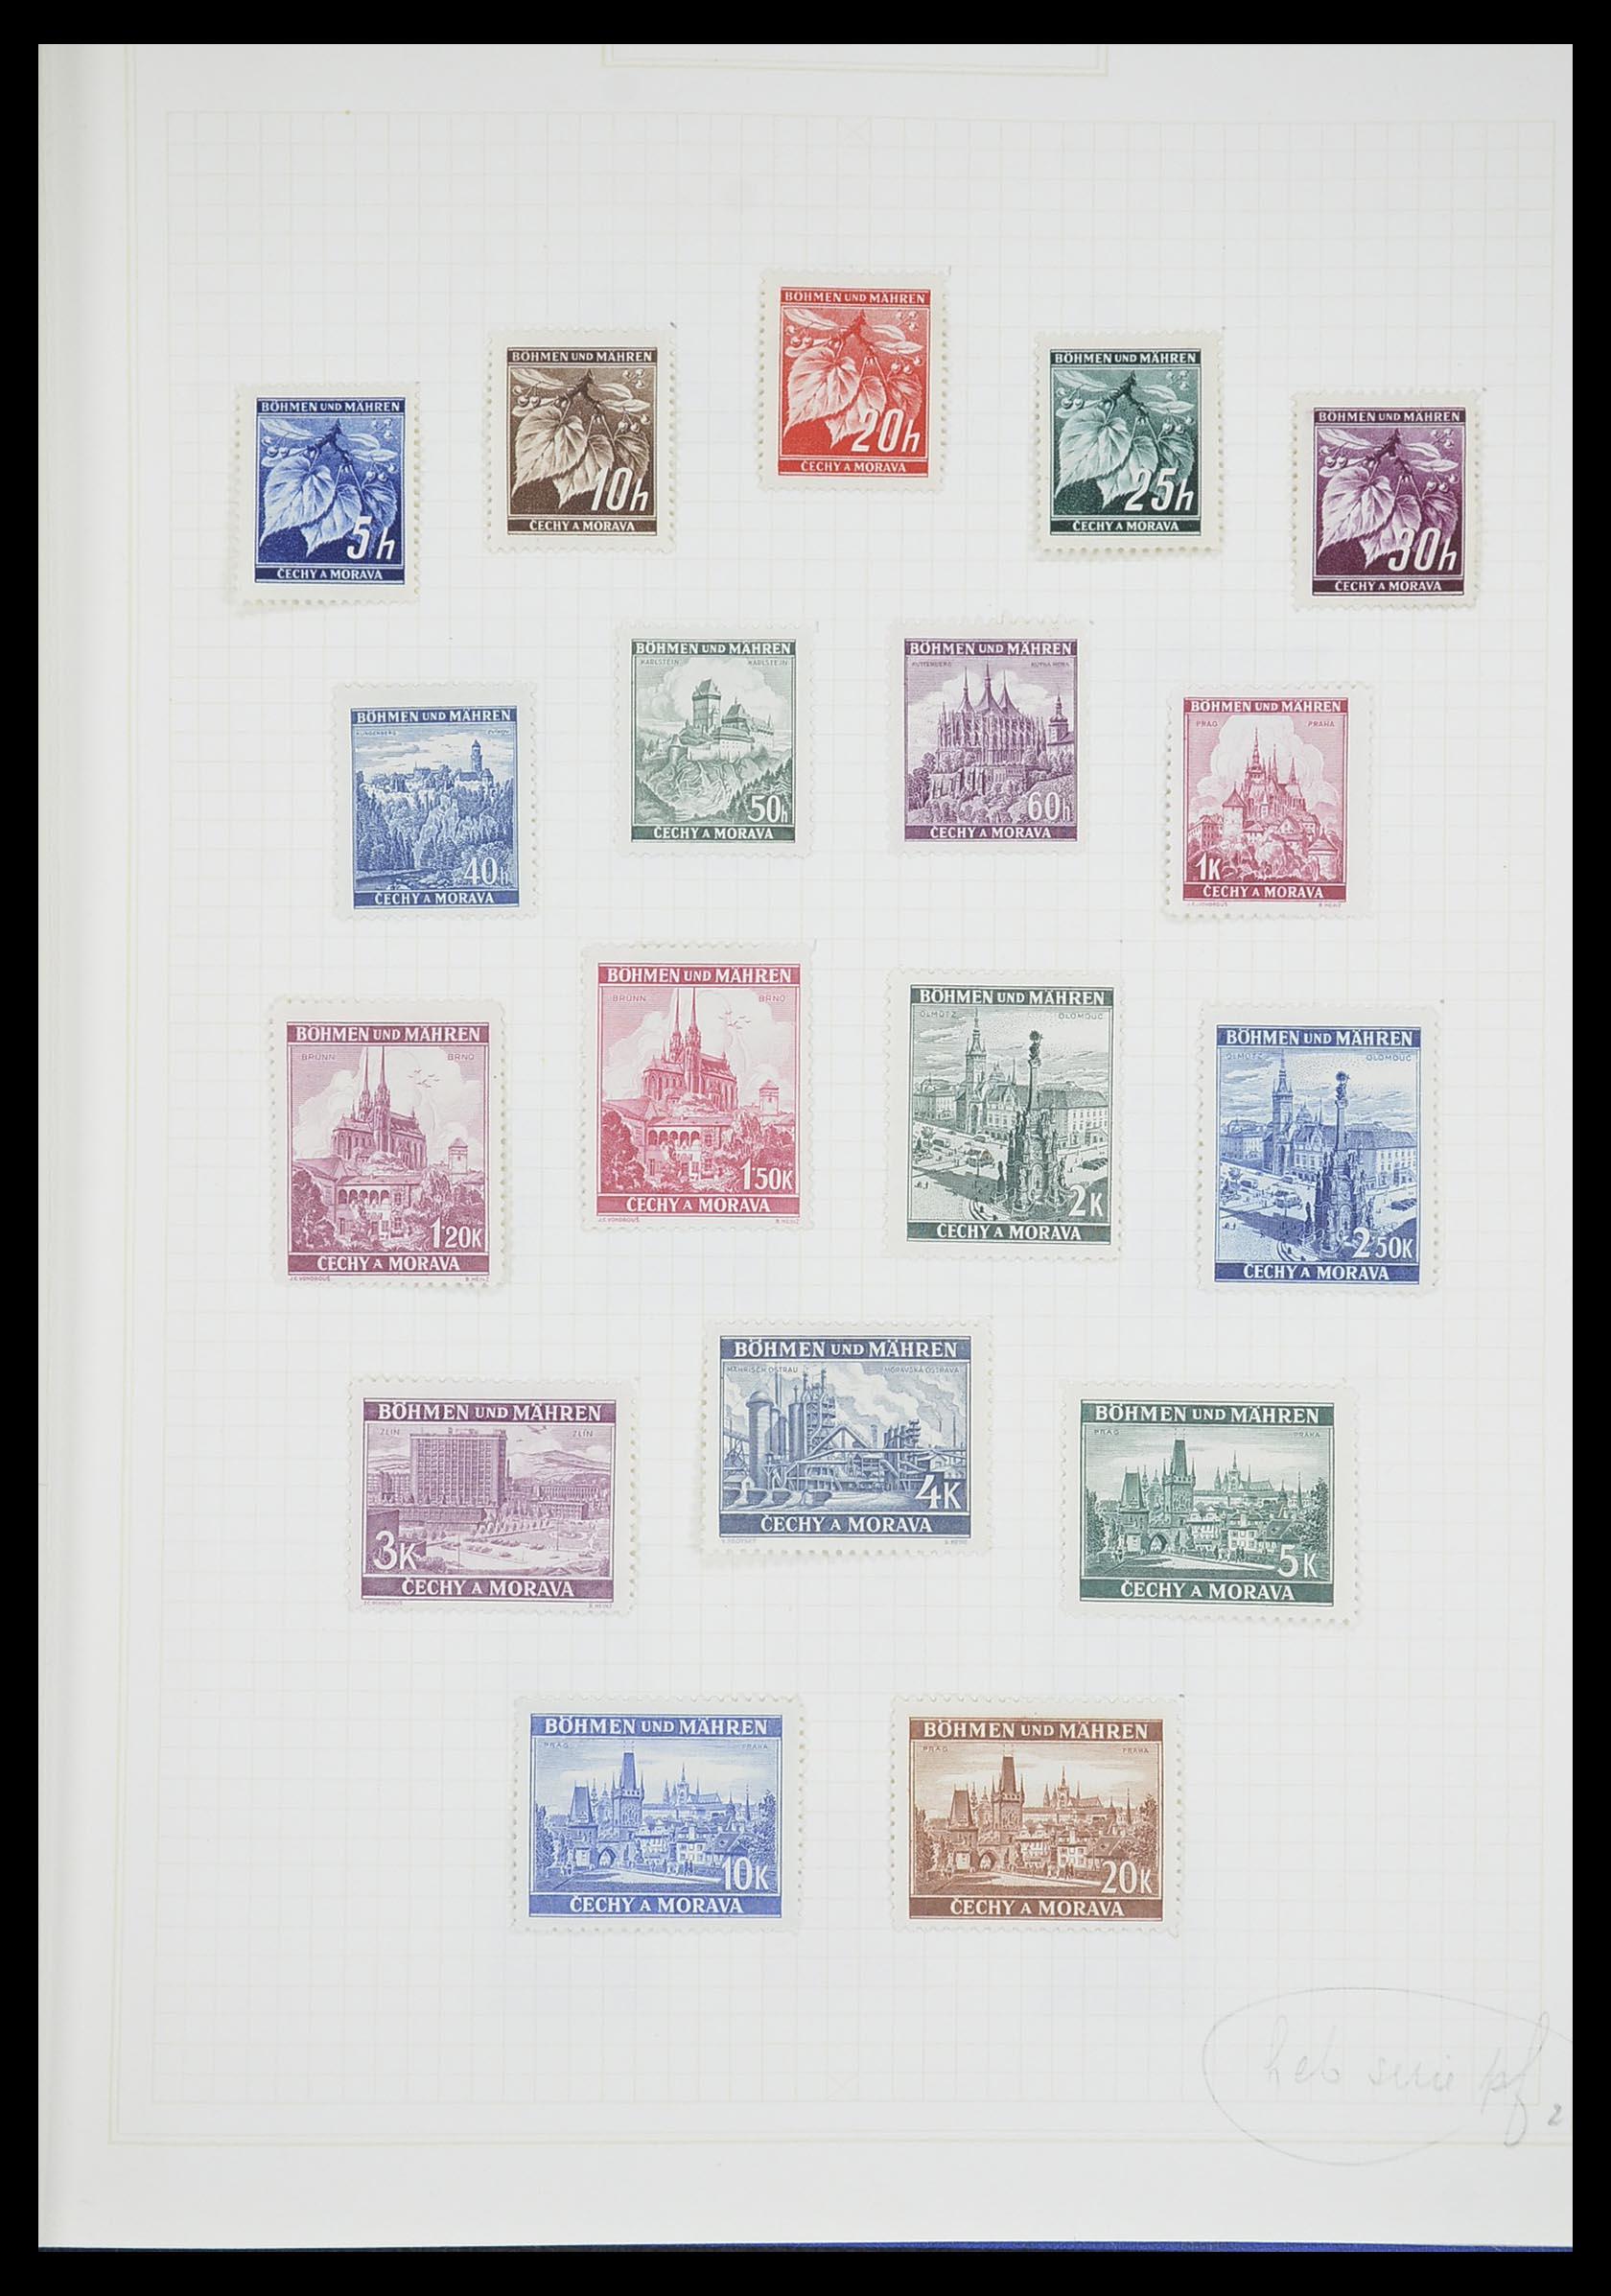 33713 013 - Postzegelverzameling 33713 Duitse bezettingen WO I en WO II 1914-1945